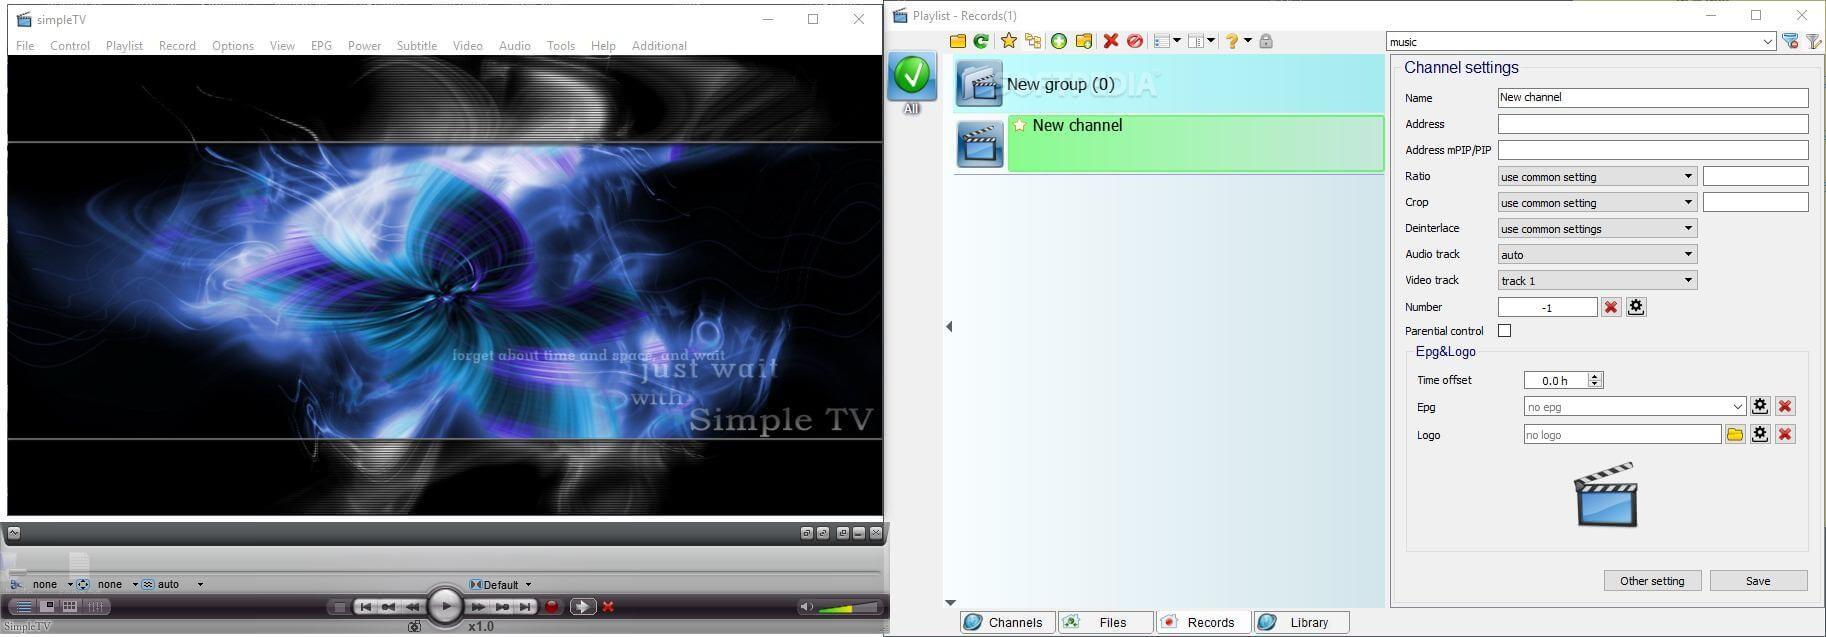 Simple TV - Best IPTV Players for Windows